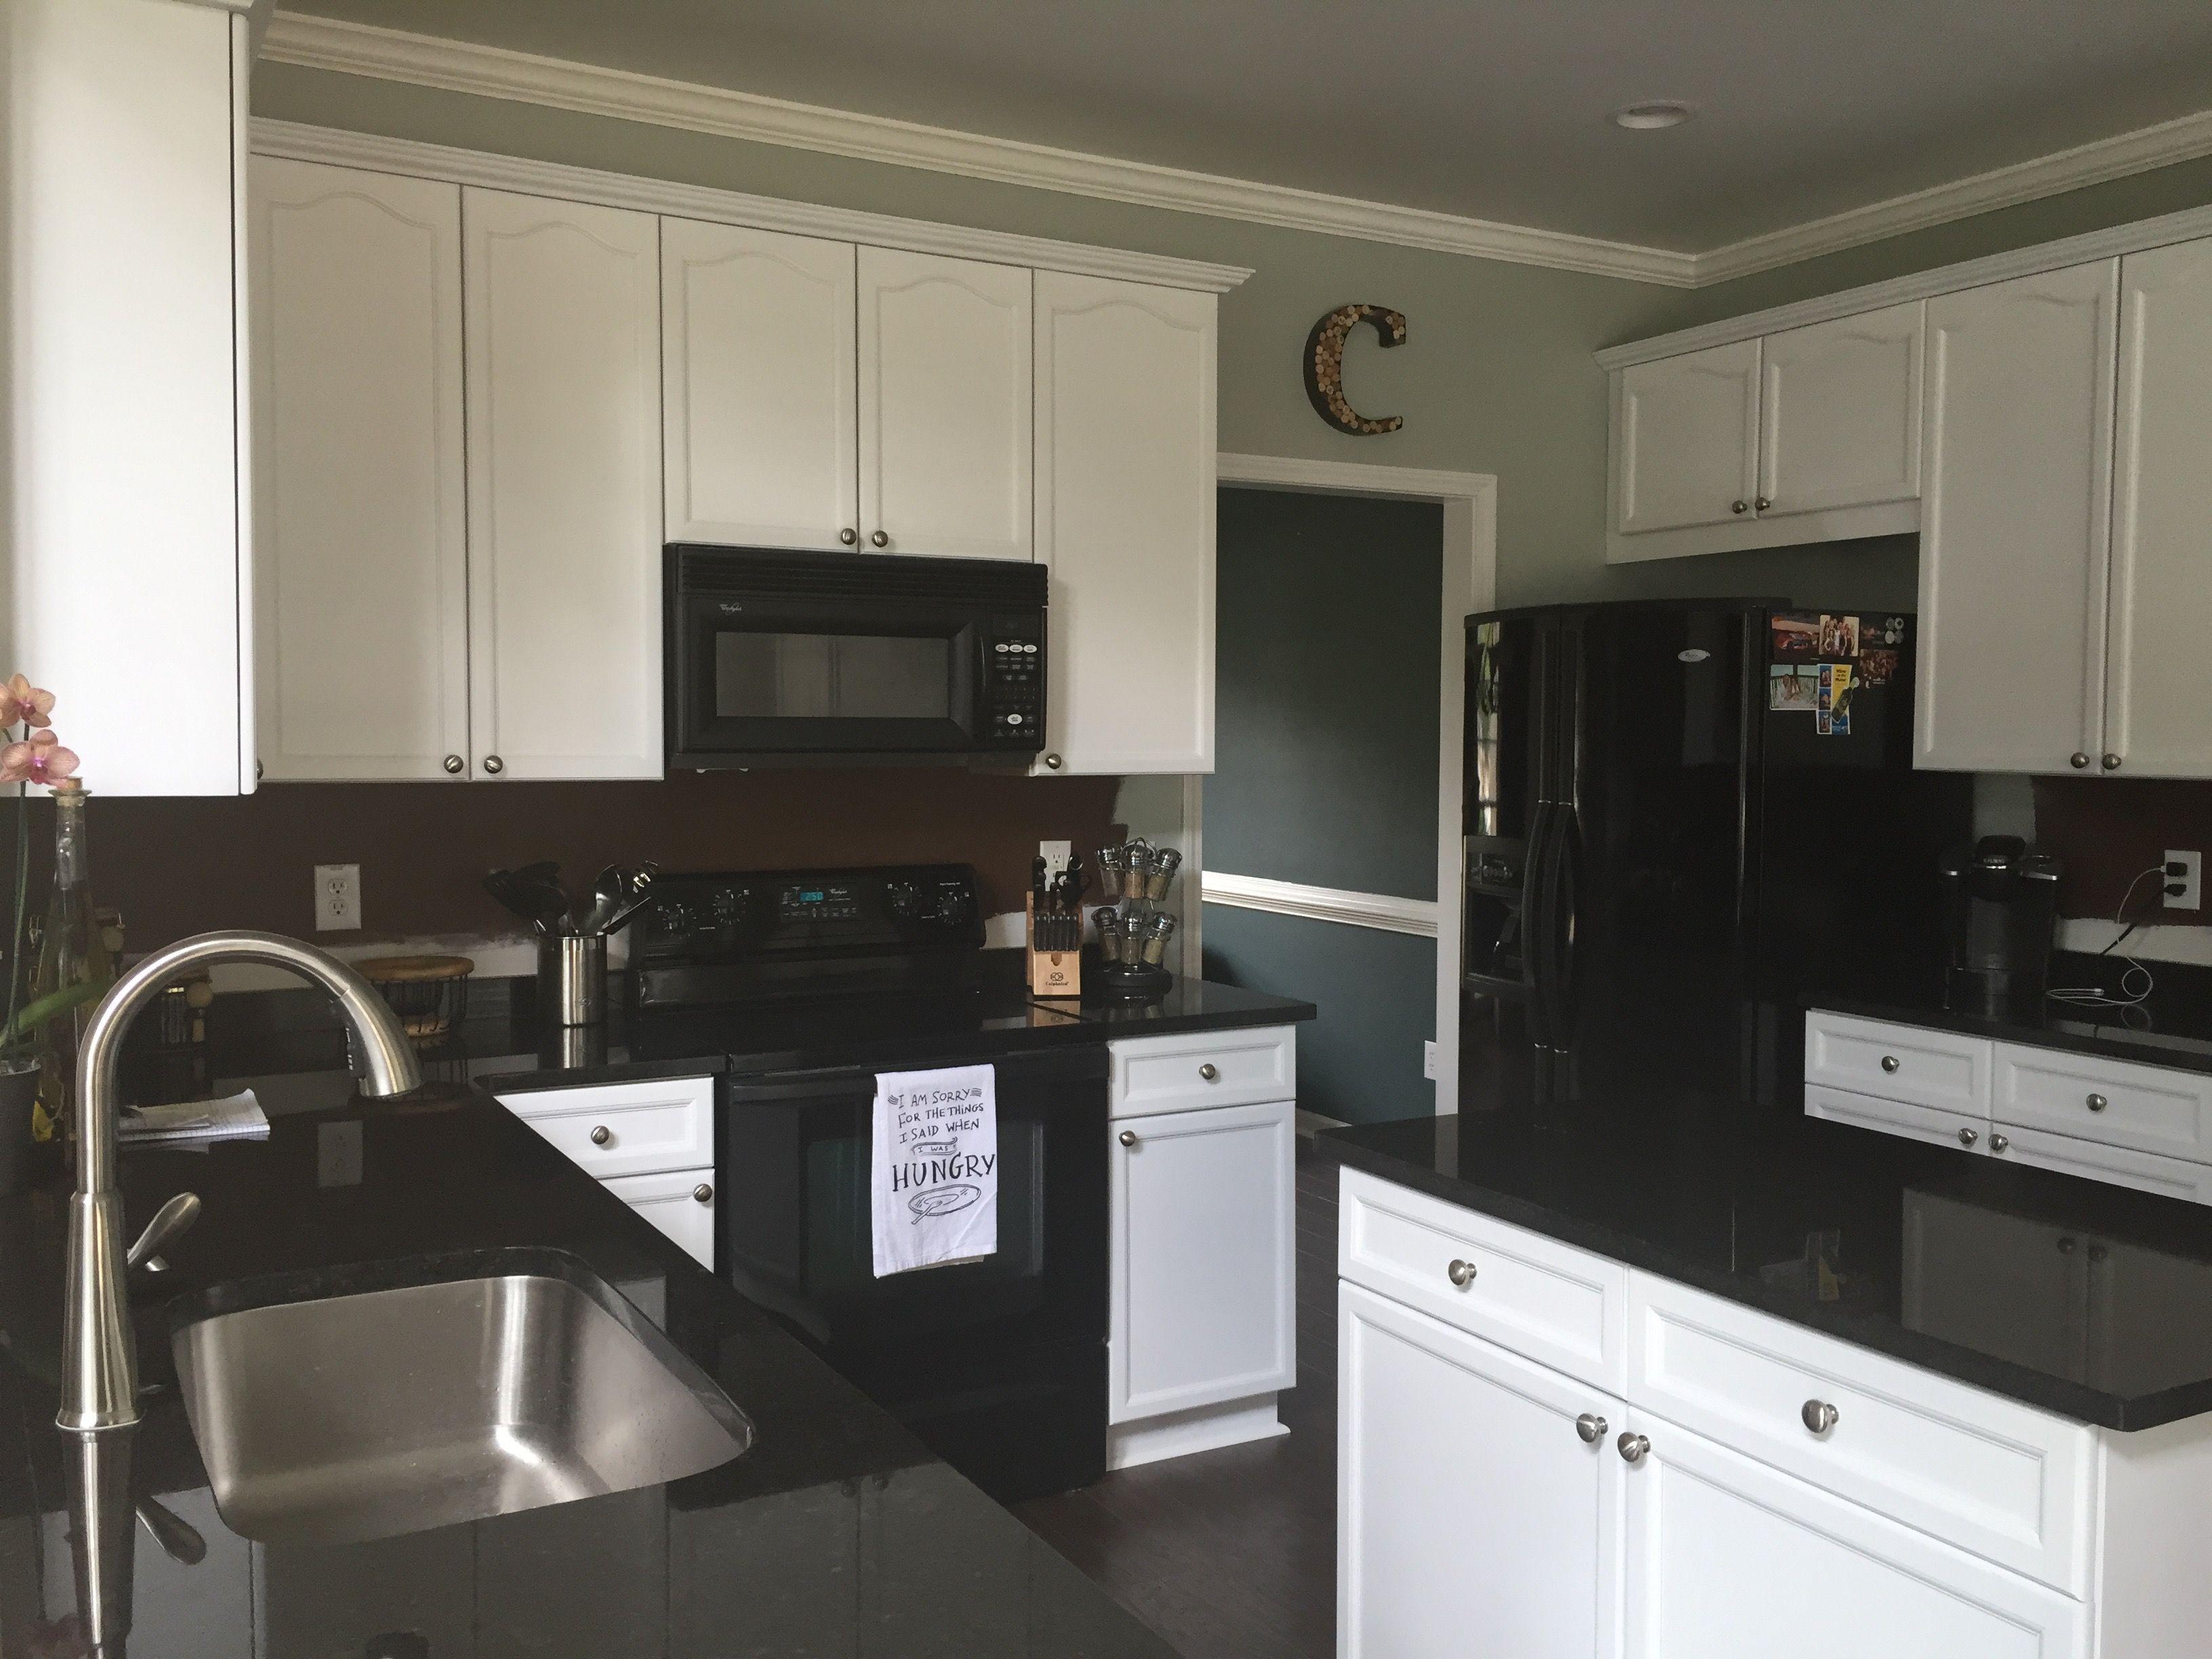 Best Kitchen Sherwin Williams Comfort Gray Sw 6205 Walls 400 x 300